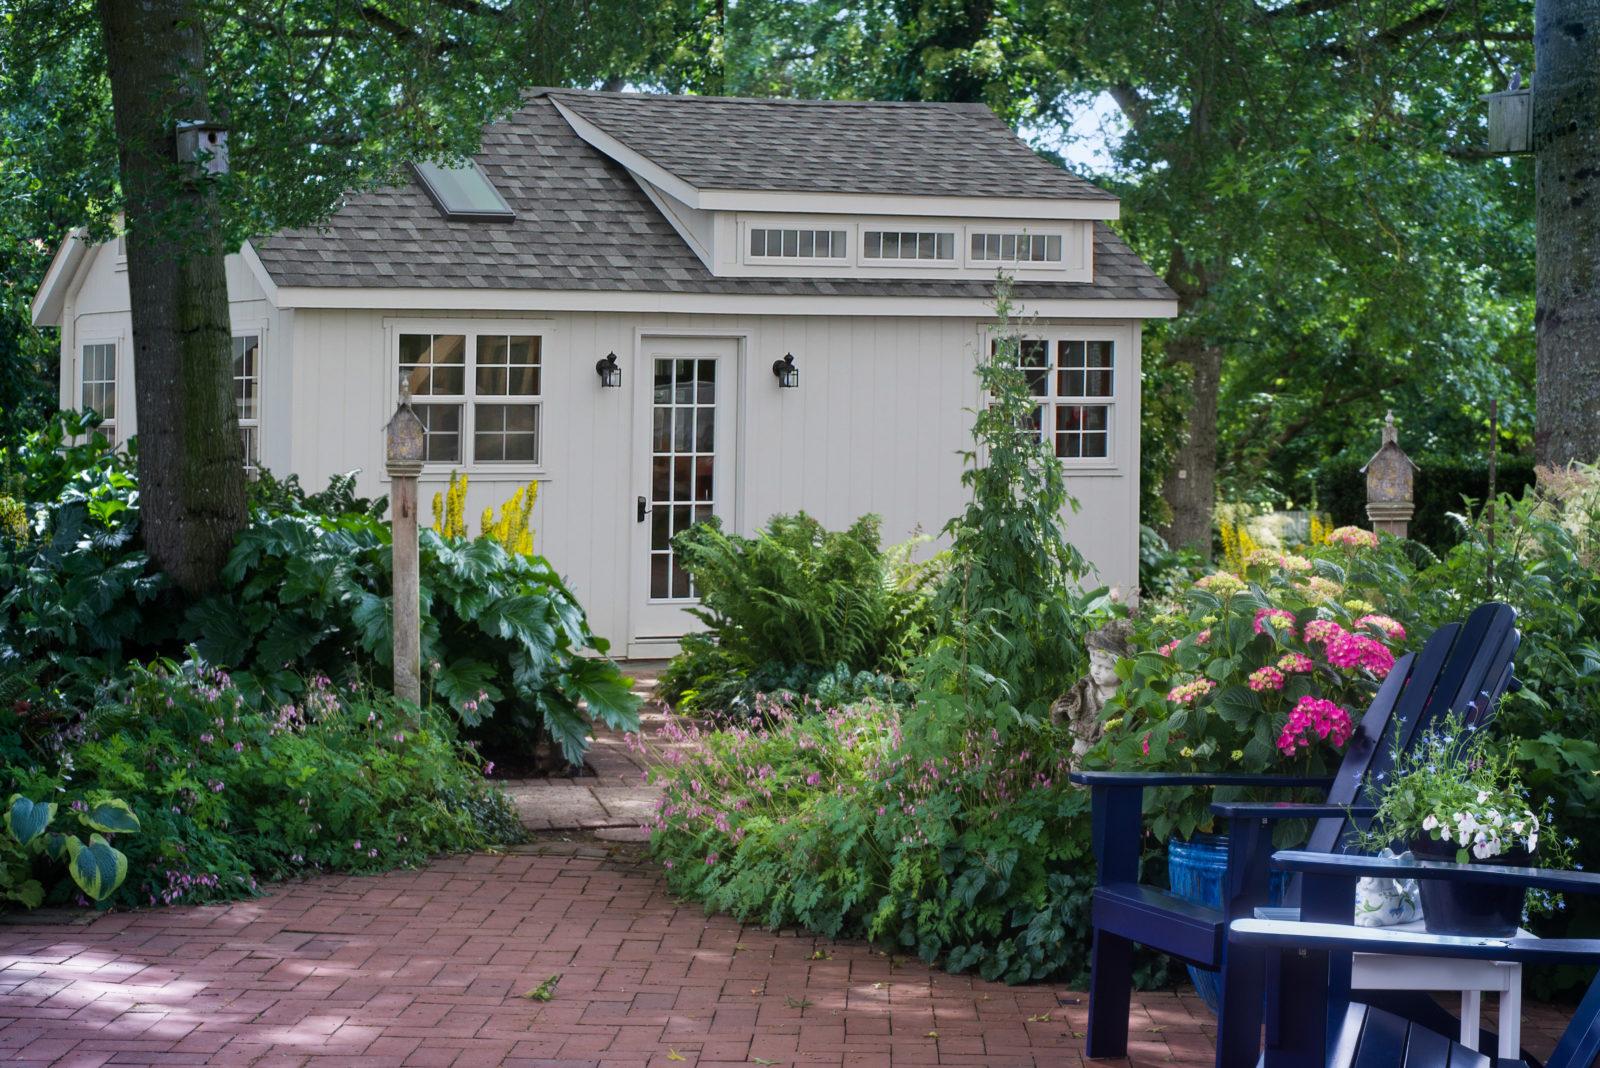 patio and playhouse